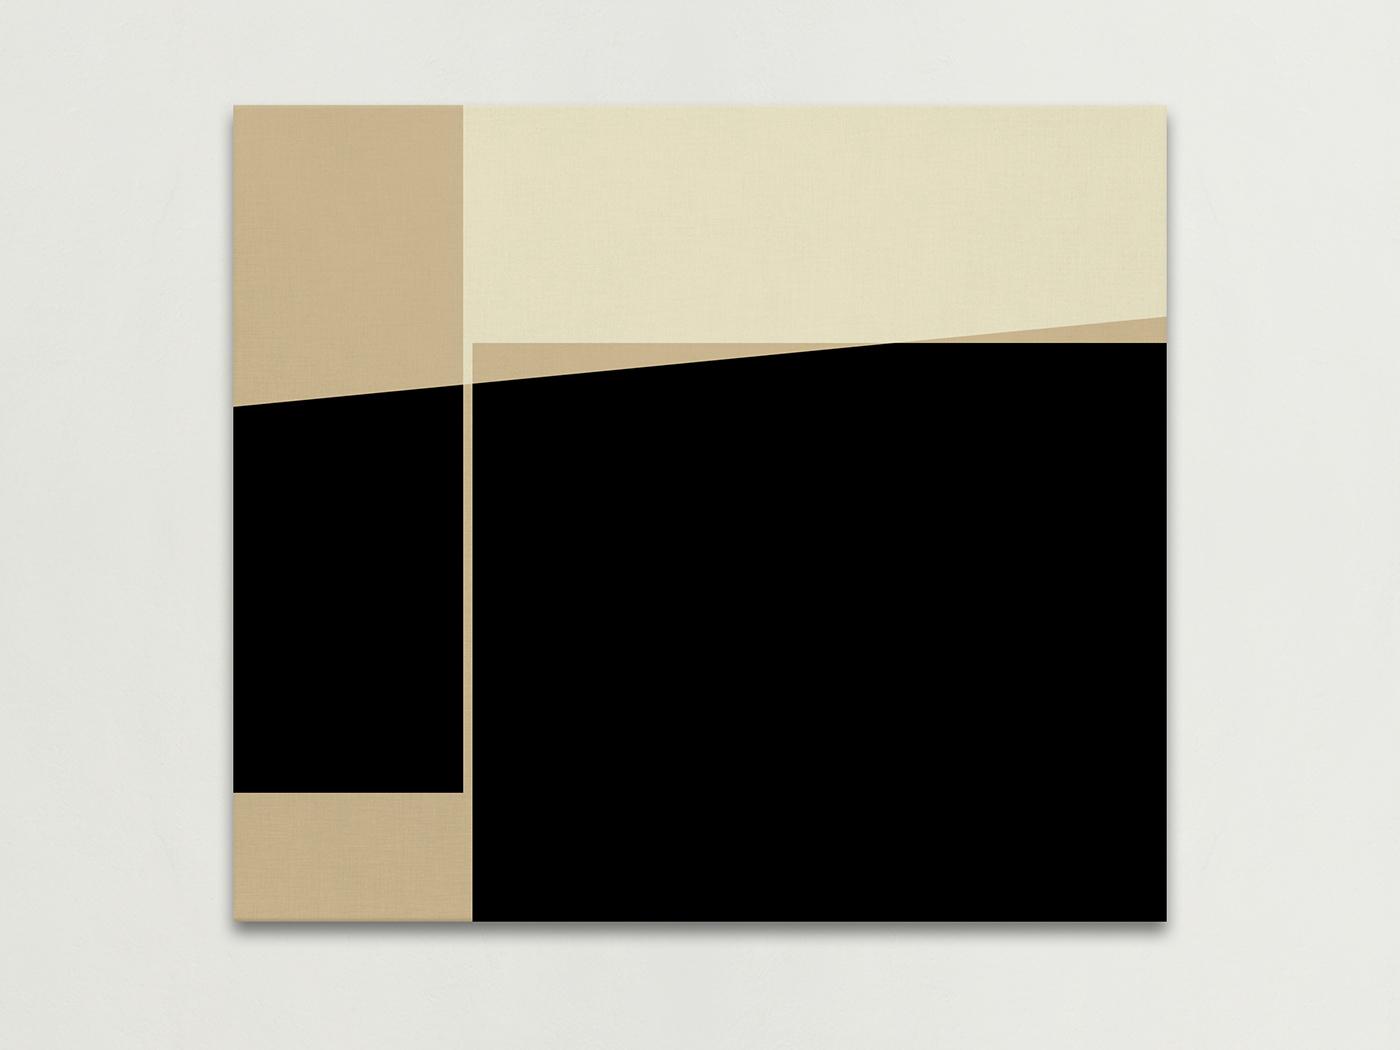 edge abstract